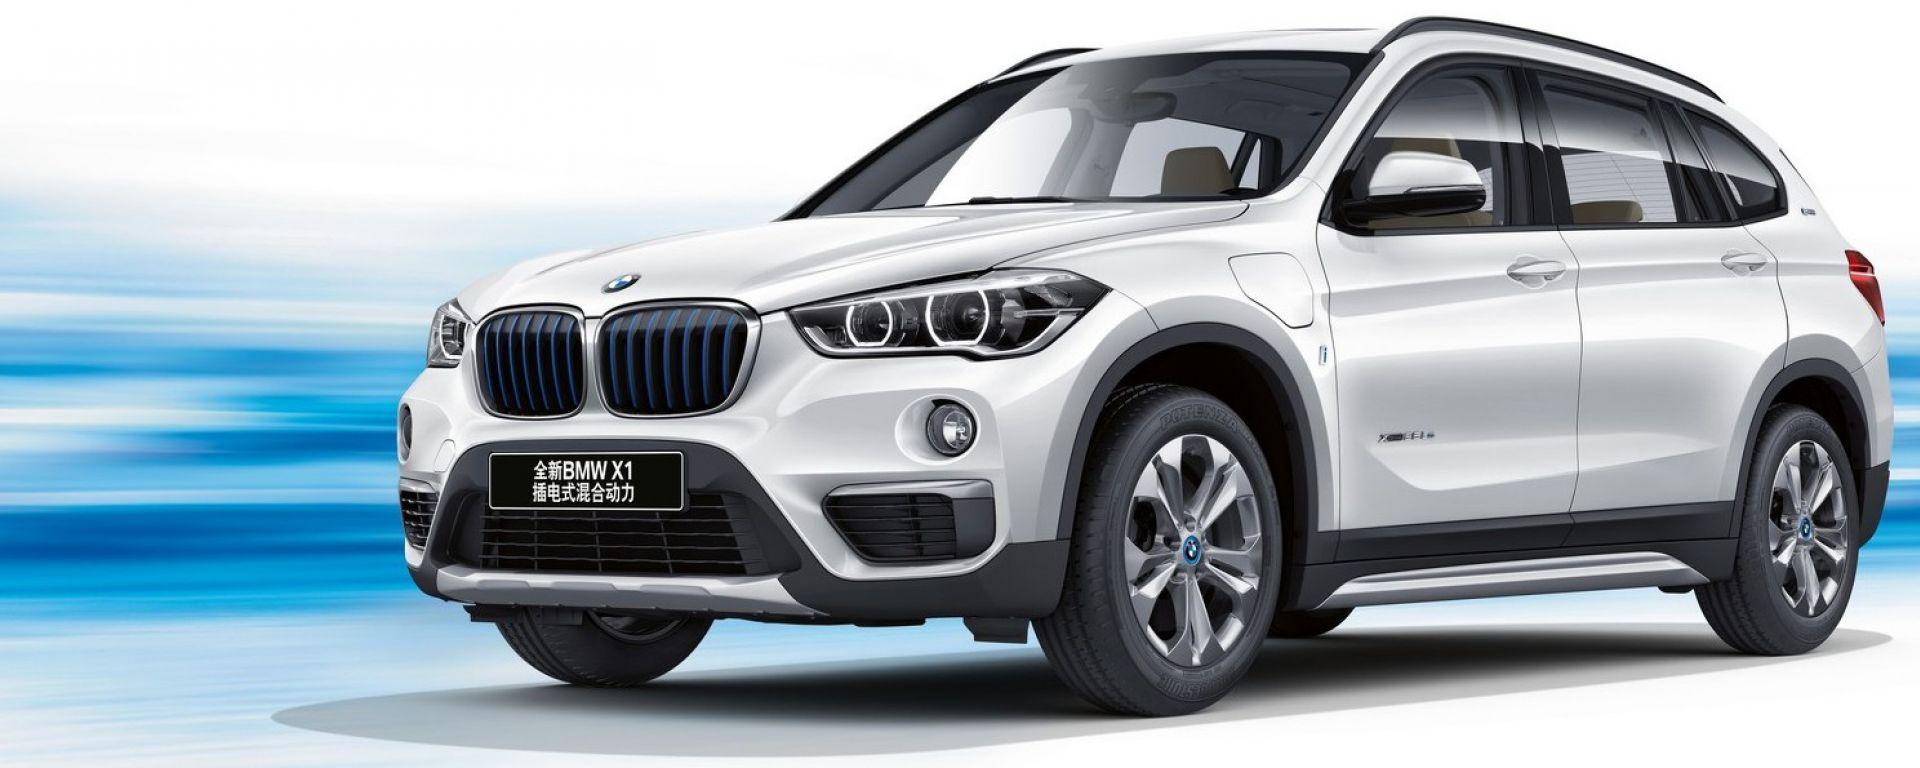 BMW X1 xDrive25Le iPerformance: debutta in Cina la X1 ibrida plug-in